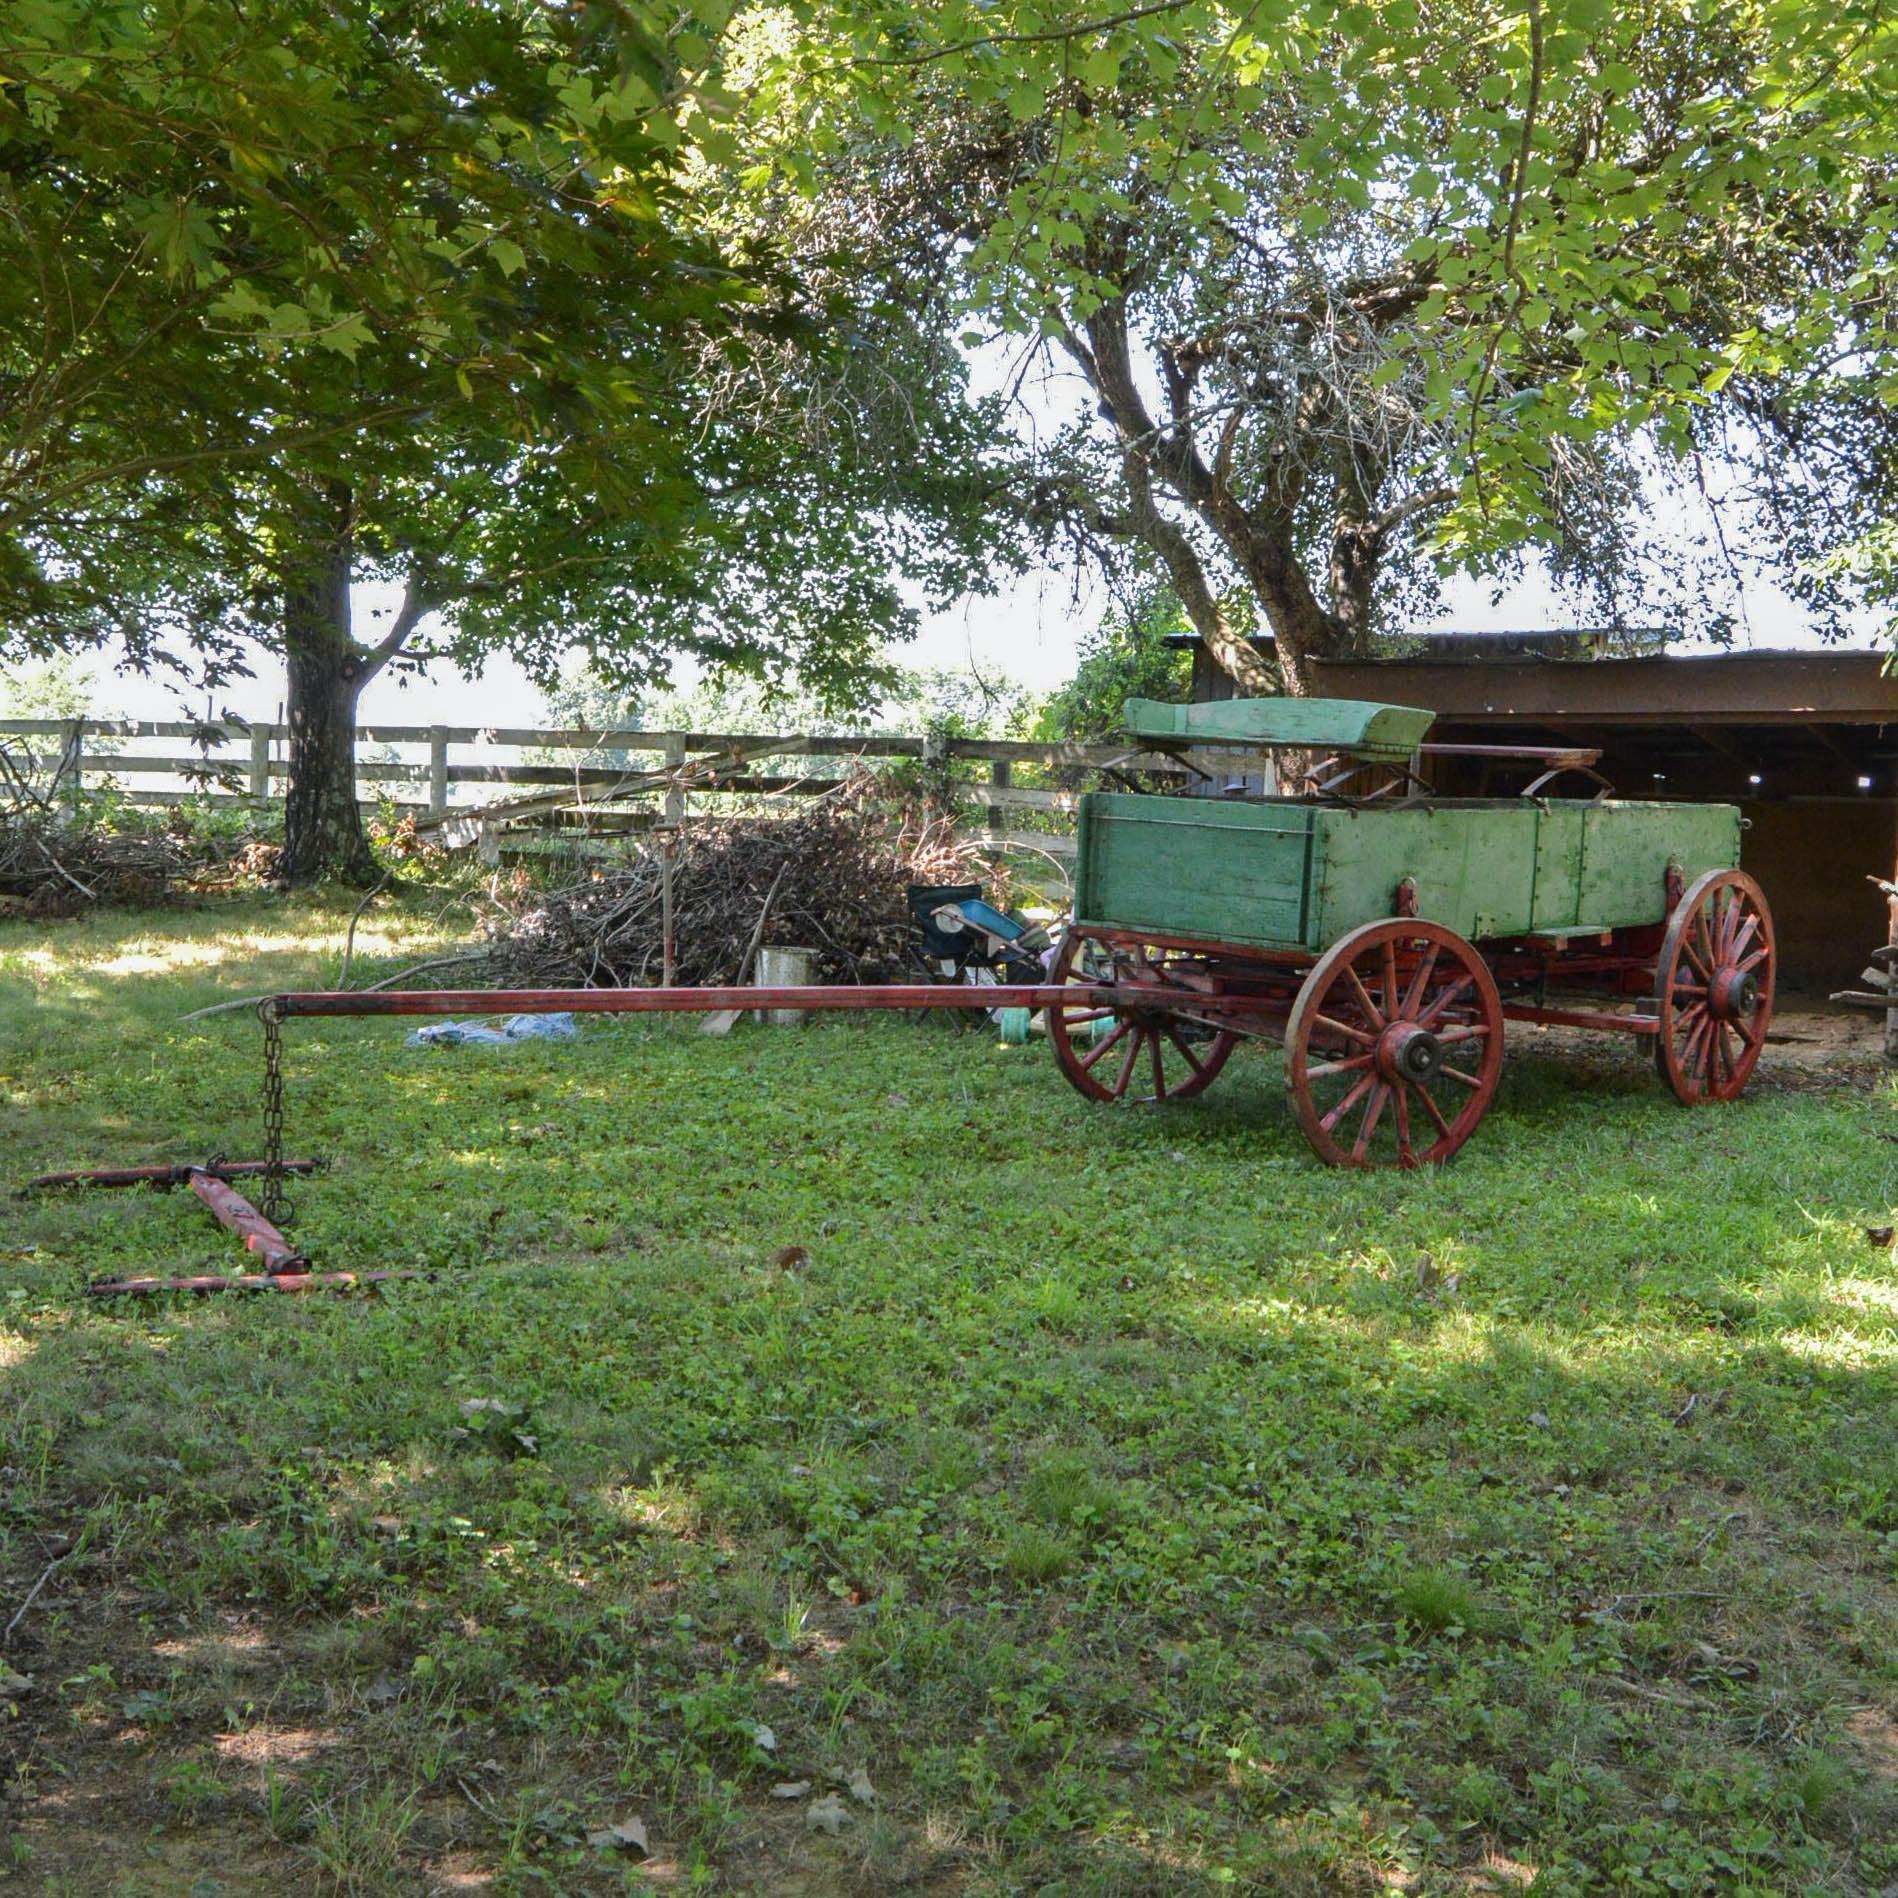 Antique OwensborO Wagon